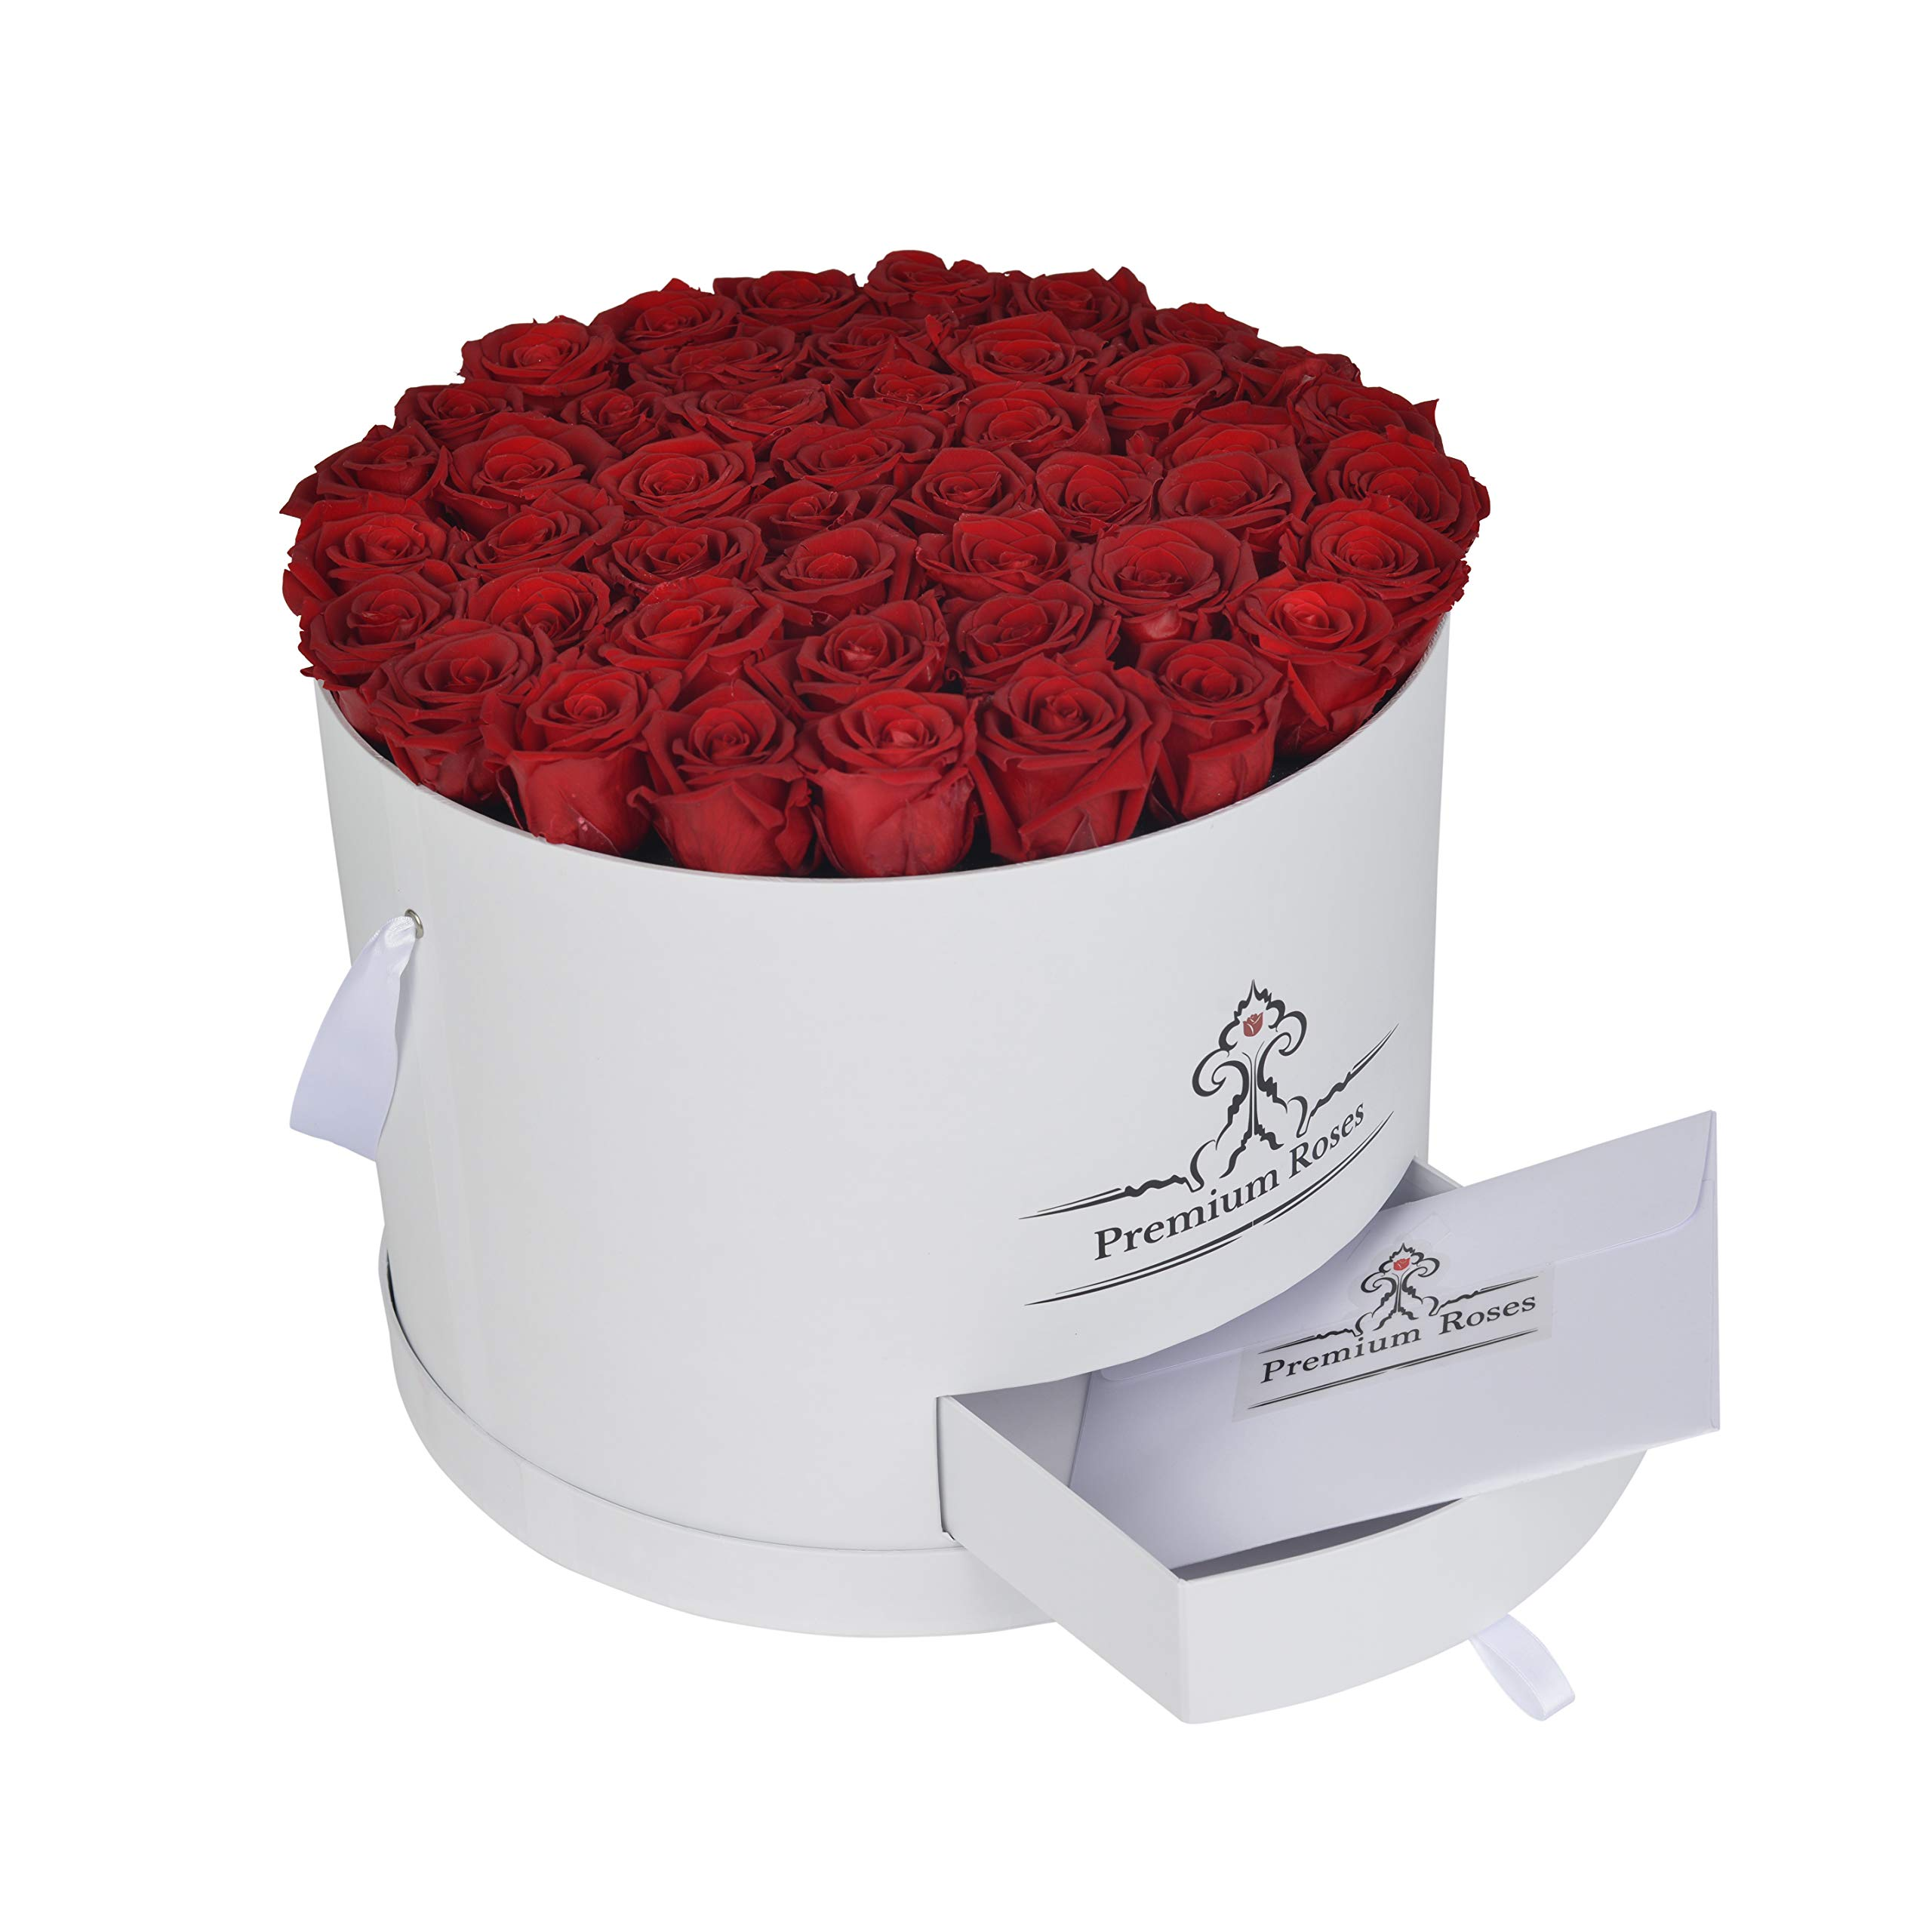 Premium Roses| Model White| Real Roses That Last 365 Days| Fresh Flowers (White Box, Large) by Premium Roses (Image #1)